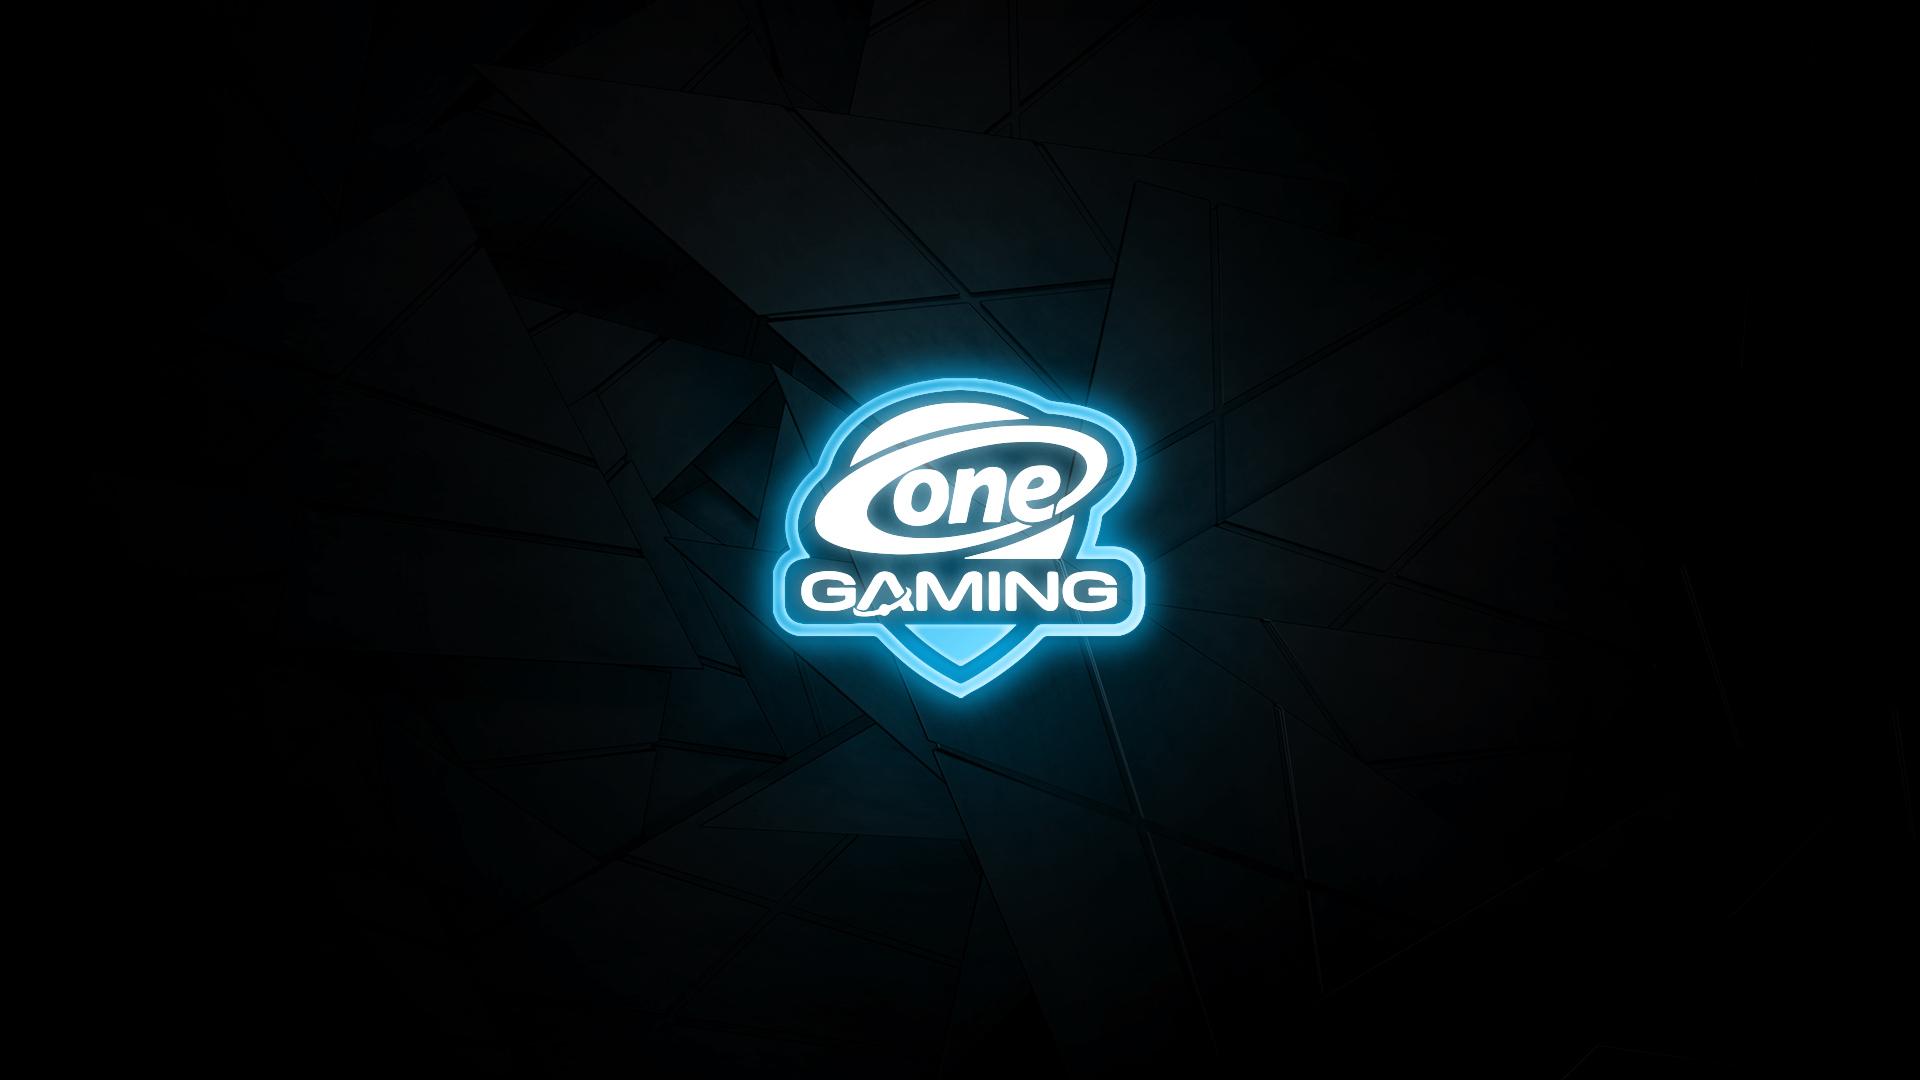 ONE Gaming Wallpaper Neon